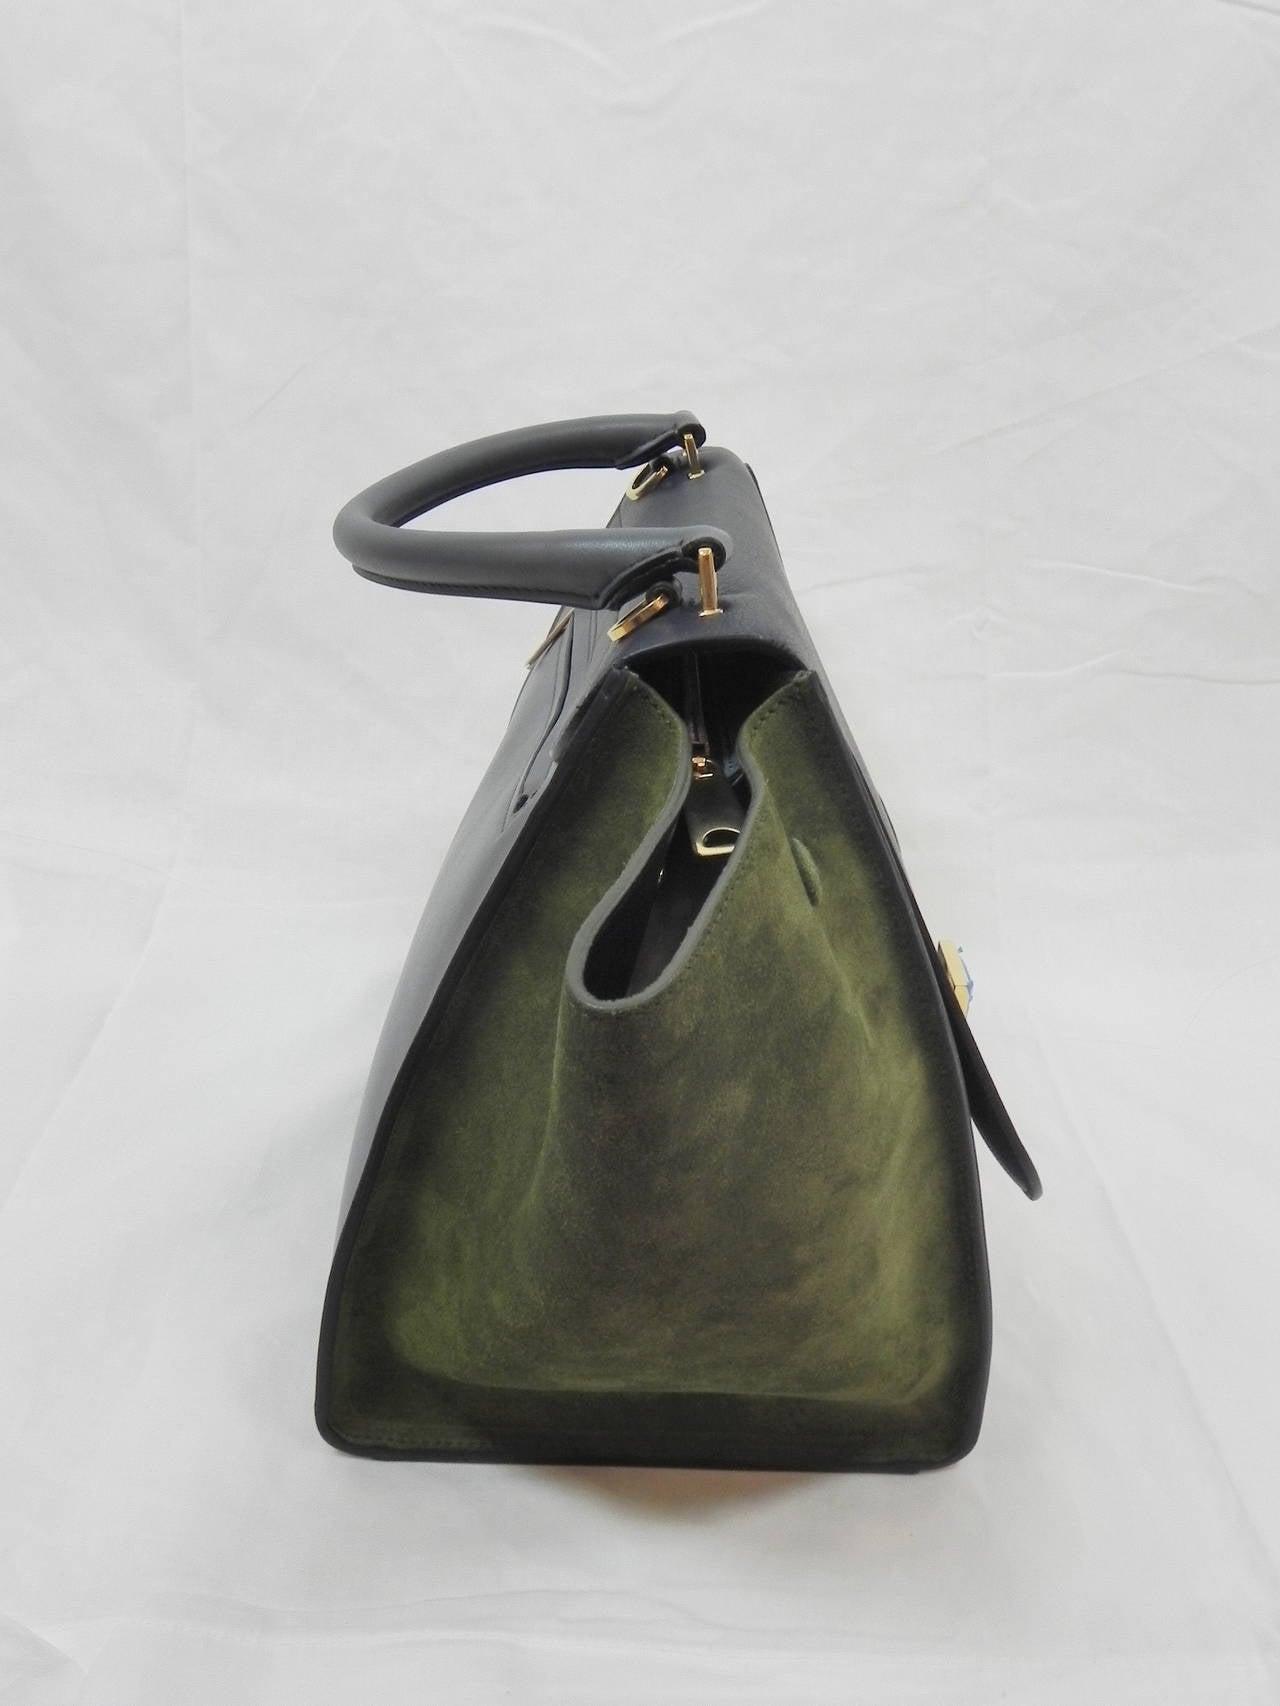 celine bags buy online - celine shetland leather zip bag